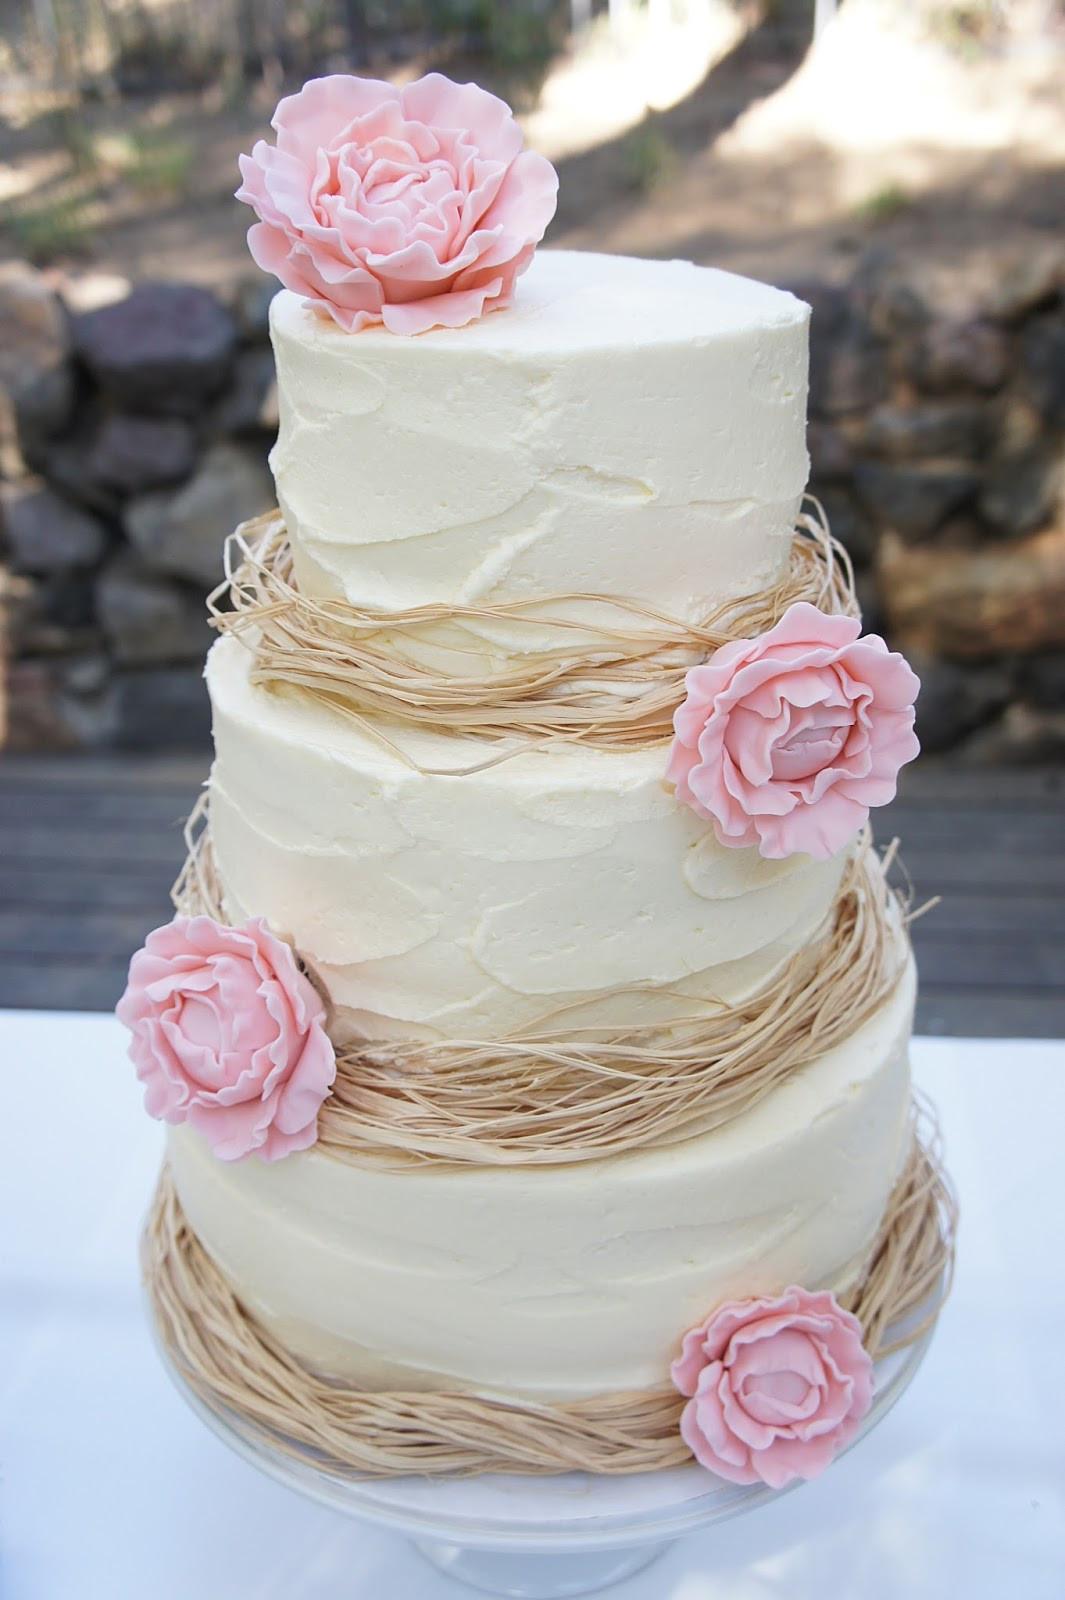 Vegan Wedding Cakes  Half Baked Co Blush and Ivory Wedding Dessert Table